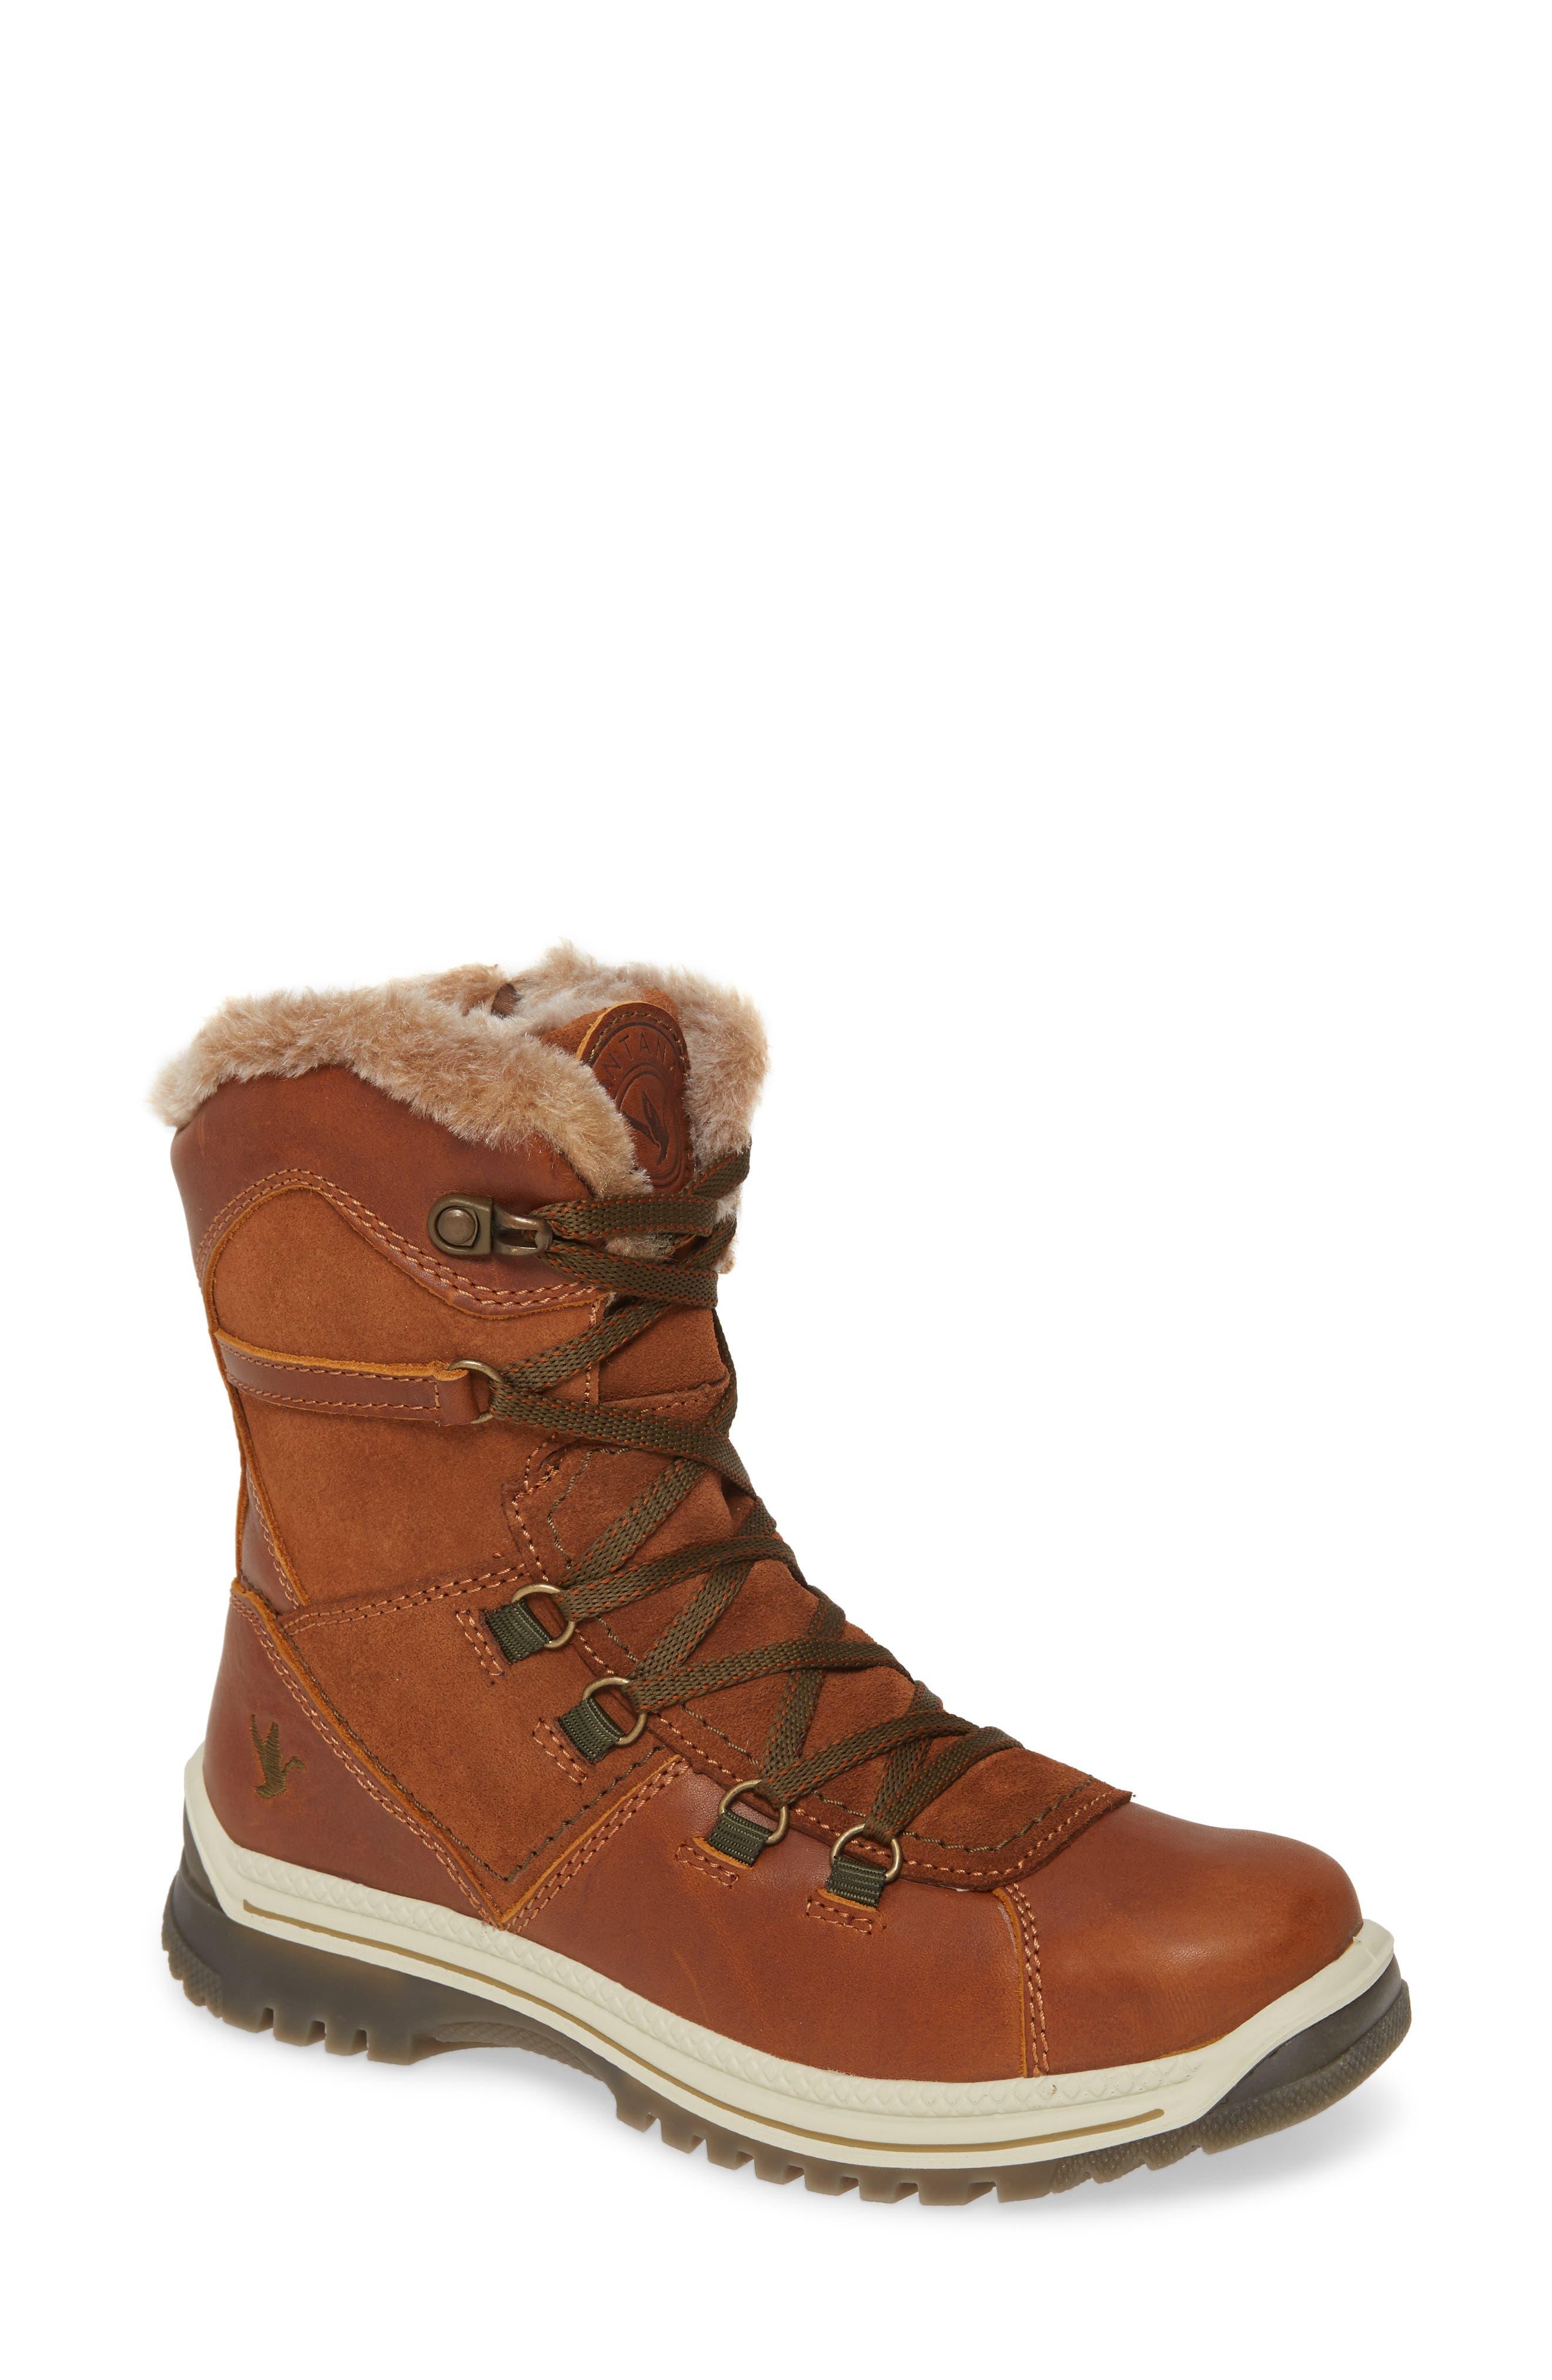 Women's Santana Canada Boots | Nordstrom